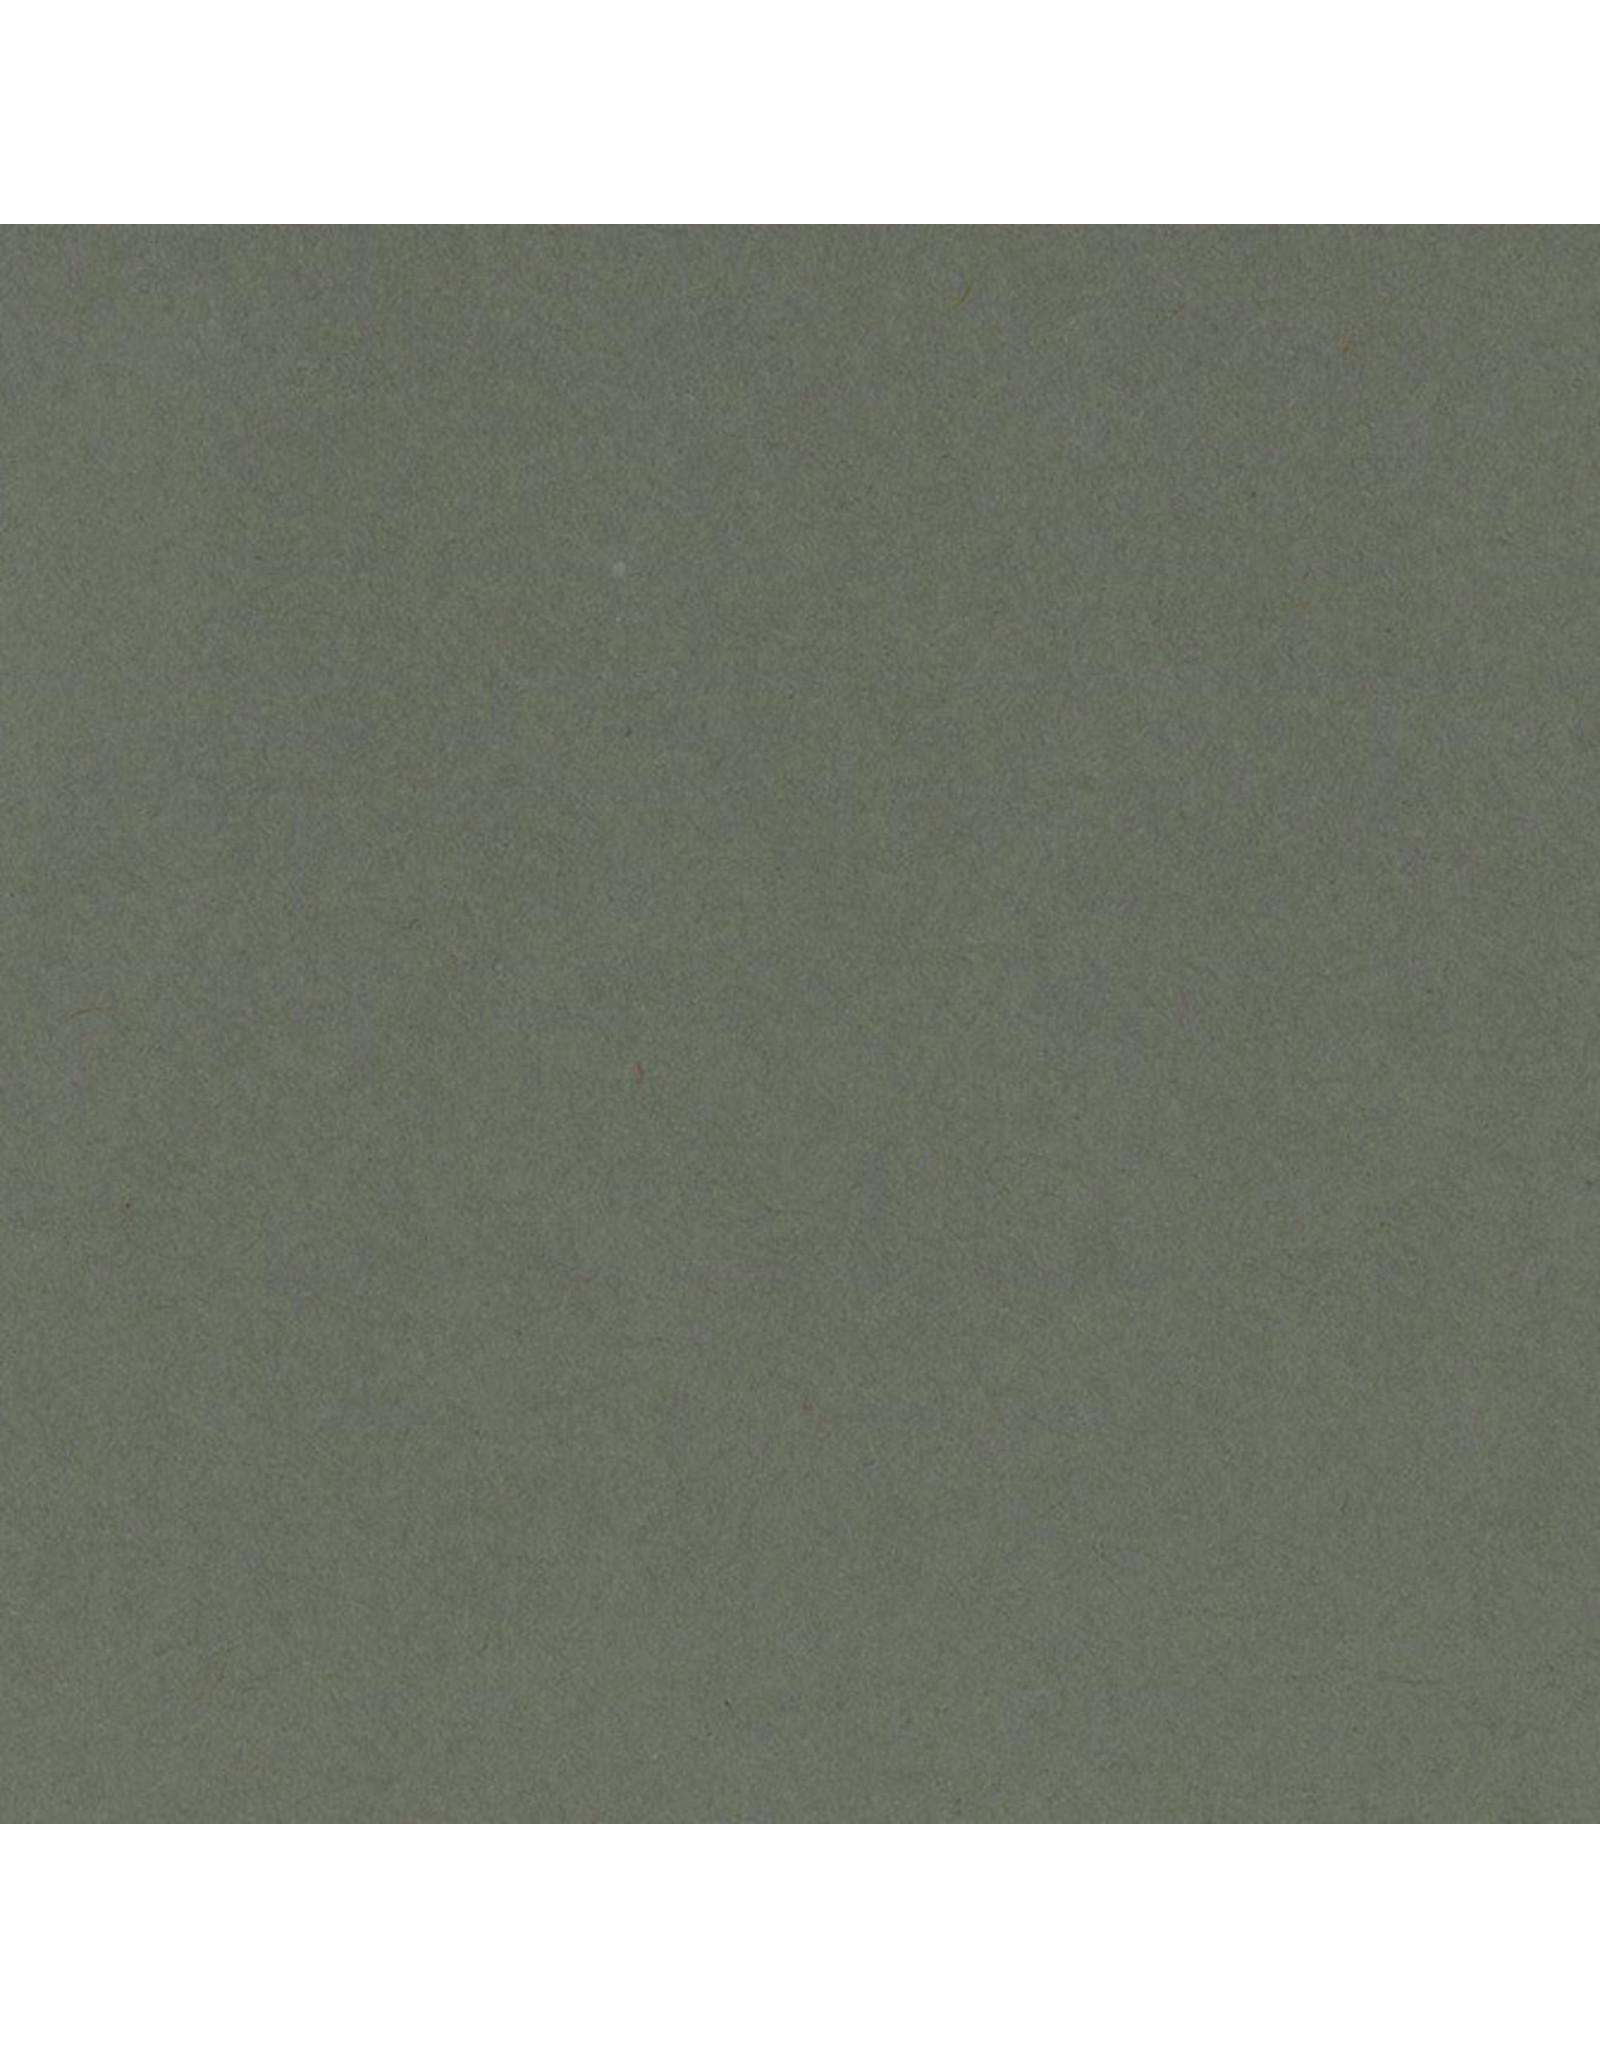 Bazzill Bazzill Card Shoppe 8.5x11 - Rock Candy